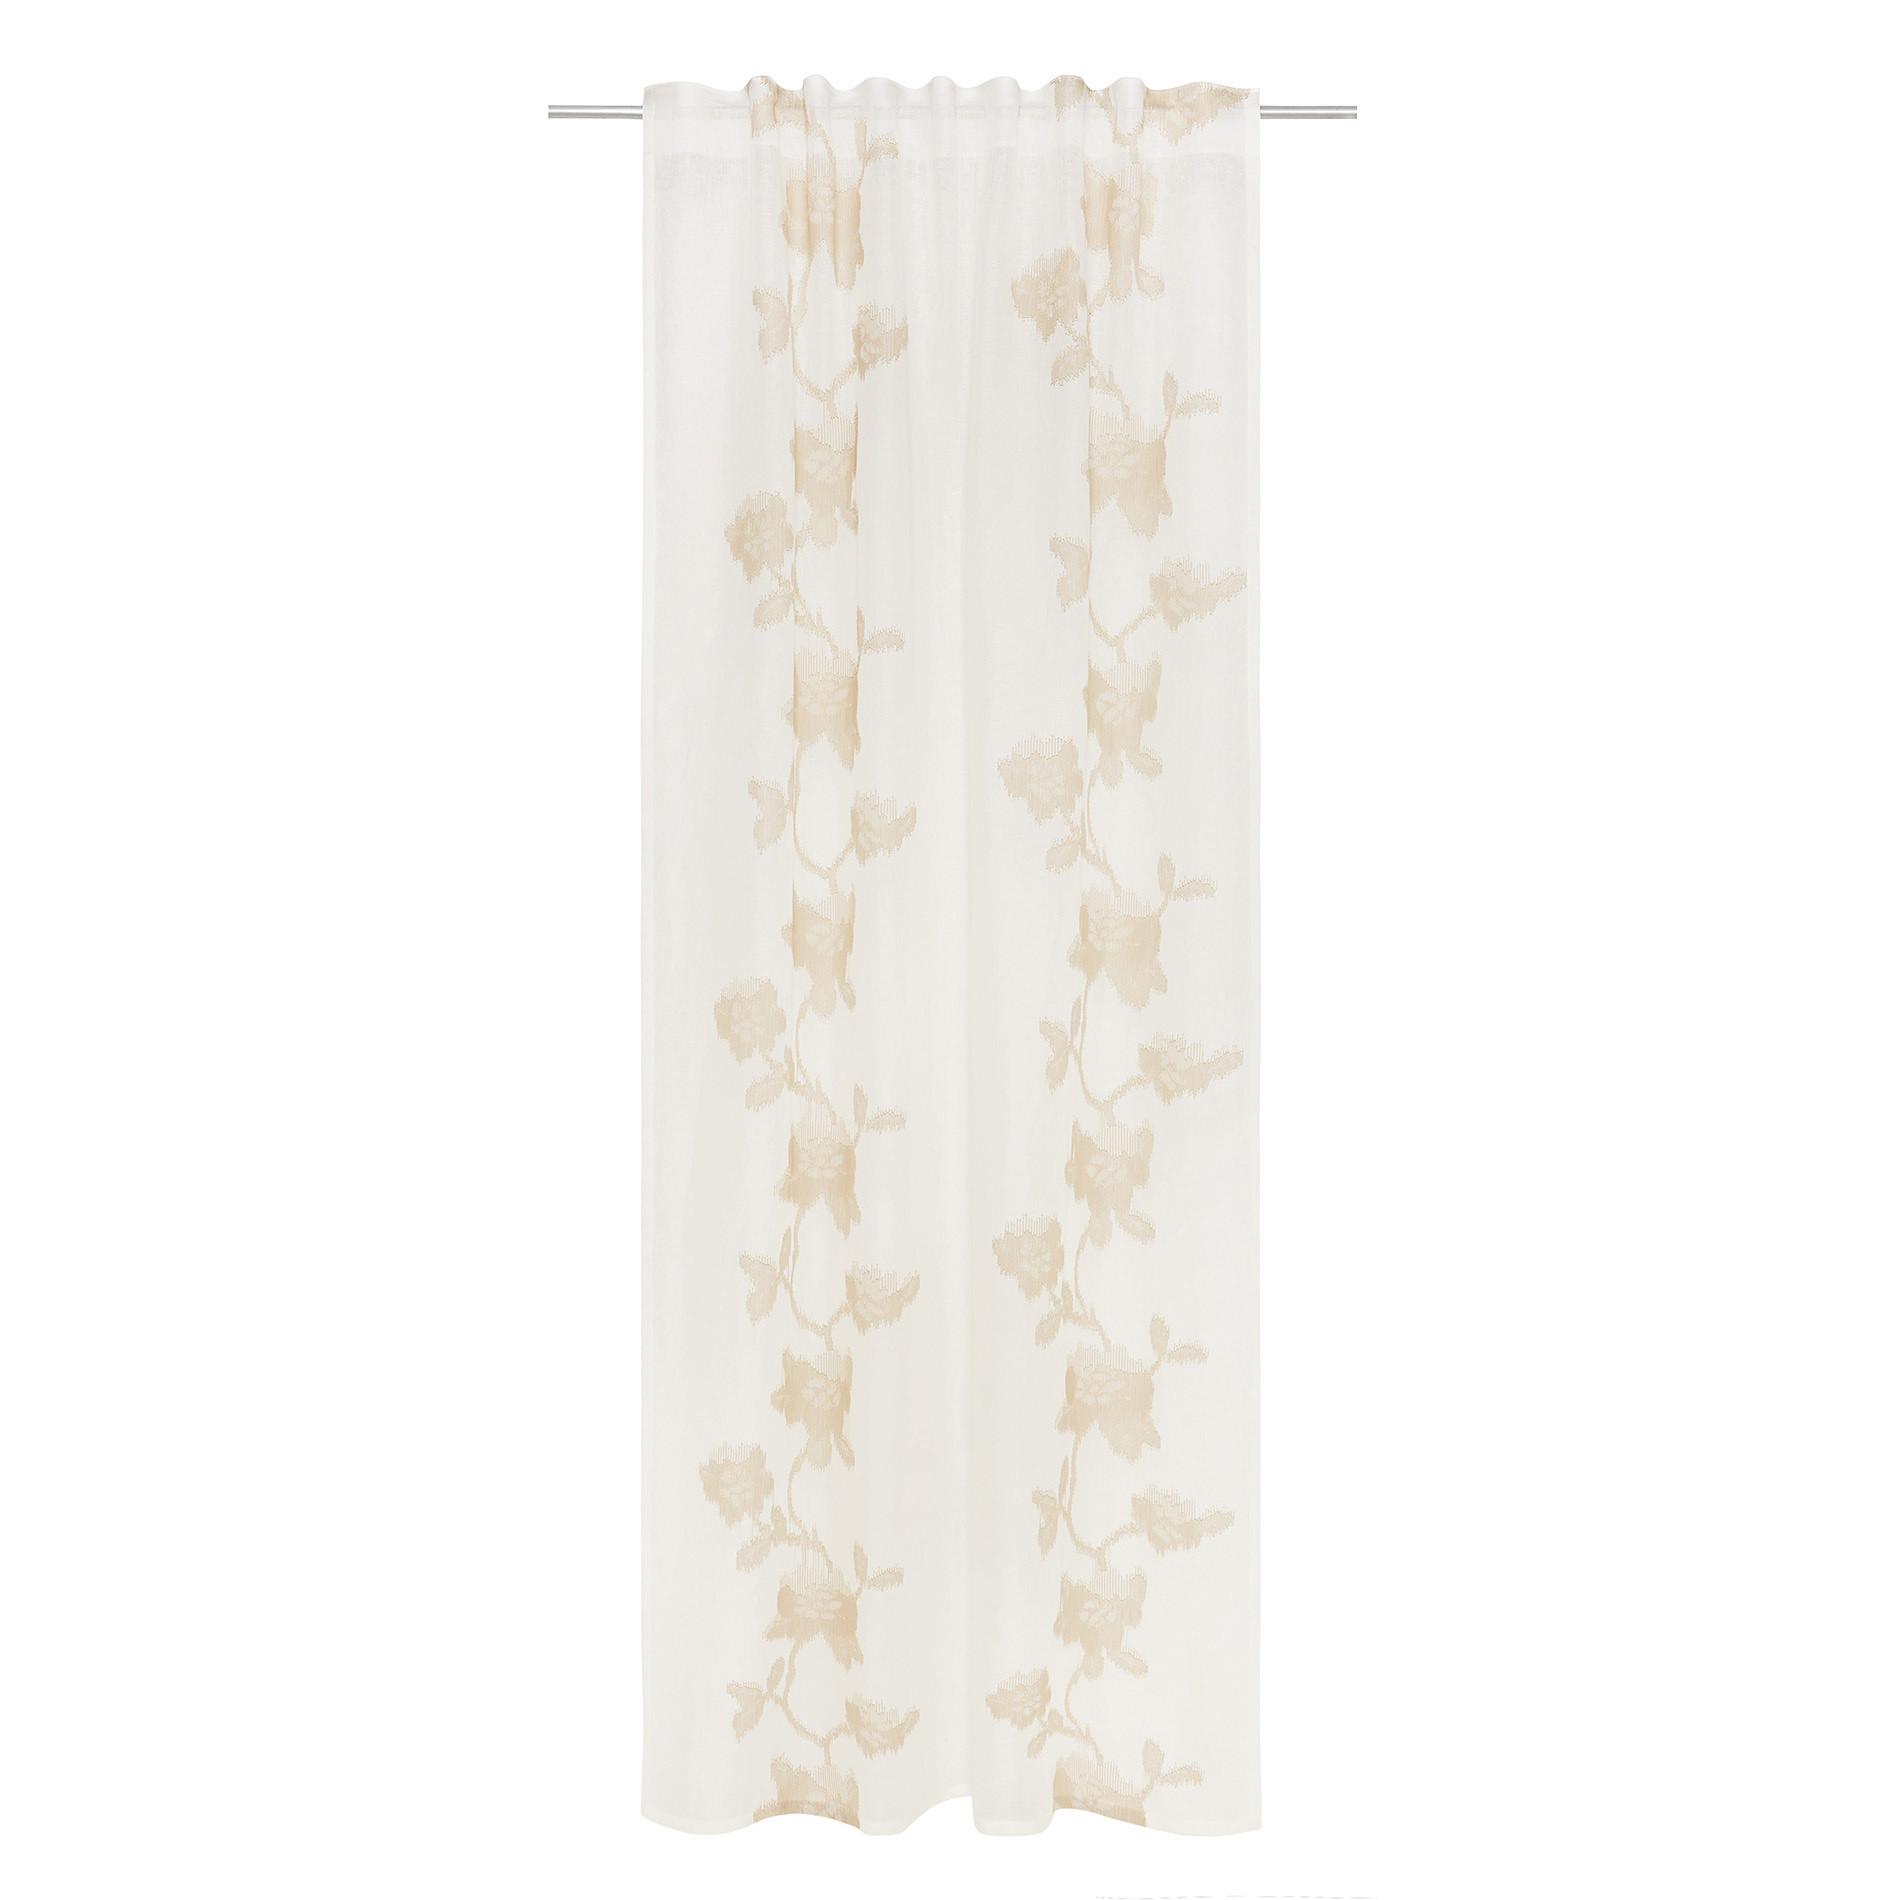 Tenda puro lino ricami floreali, Bianco/Oro, large image number 1